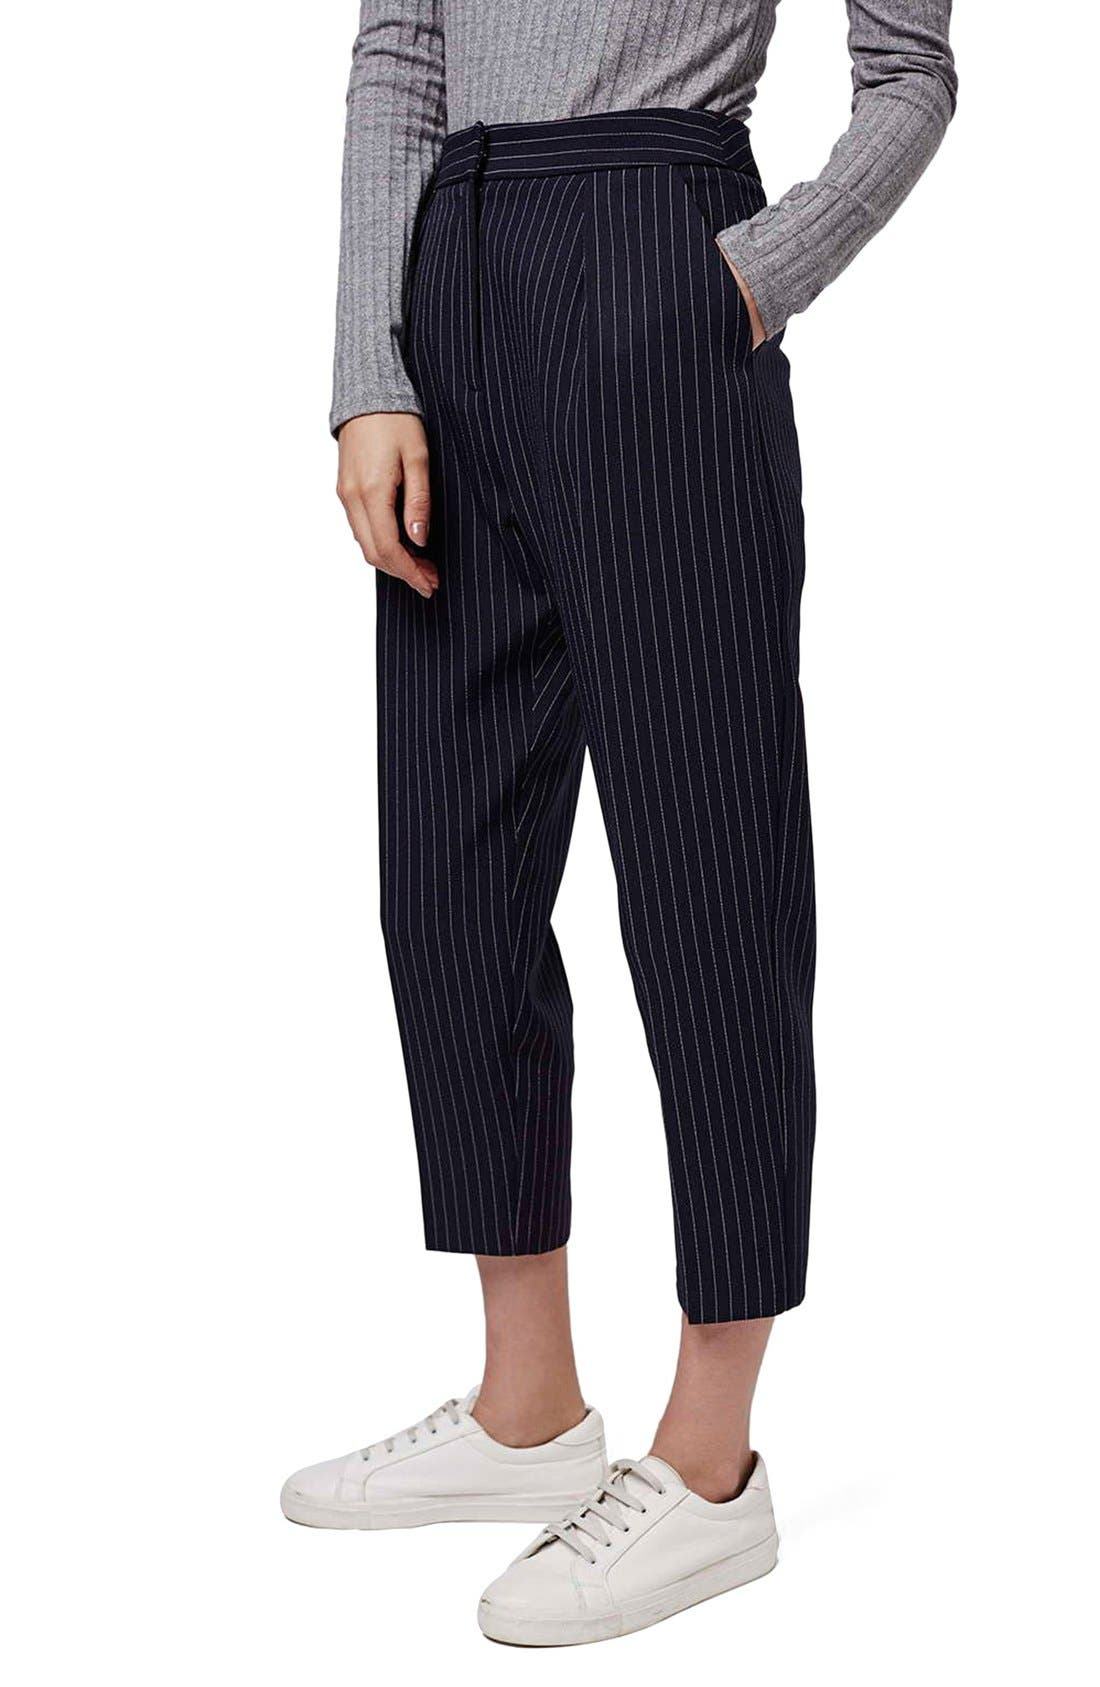 Alternate Image 1 Selected - Topshop Pinstripe Crop Trousers (Petite)